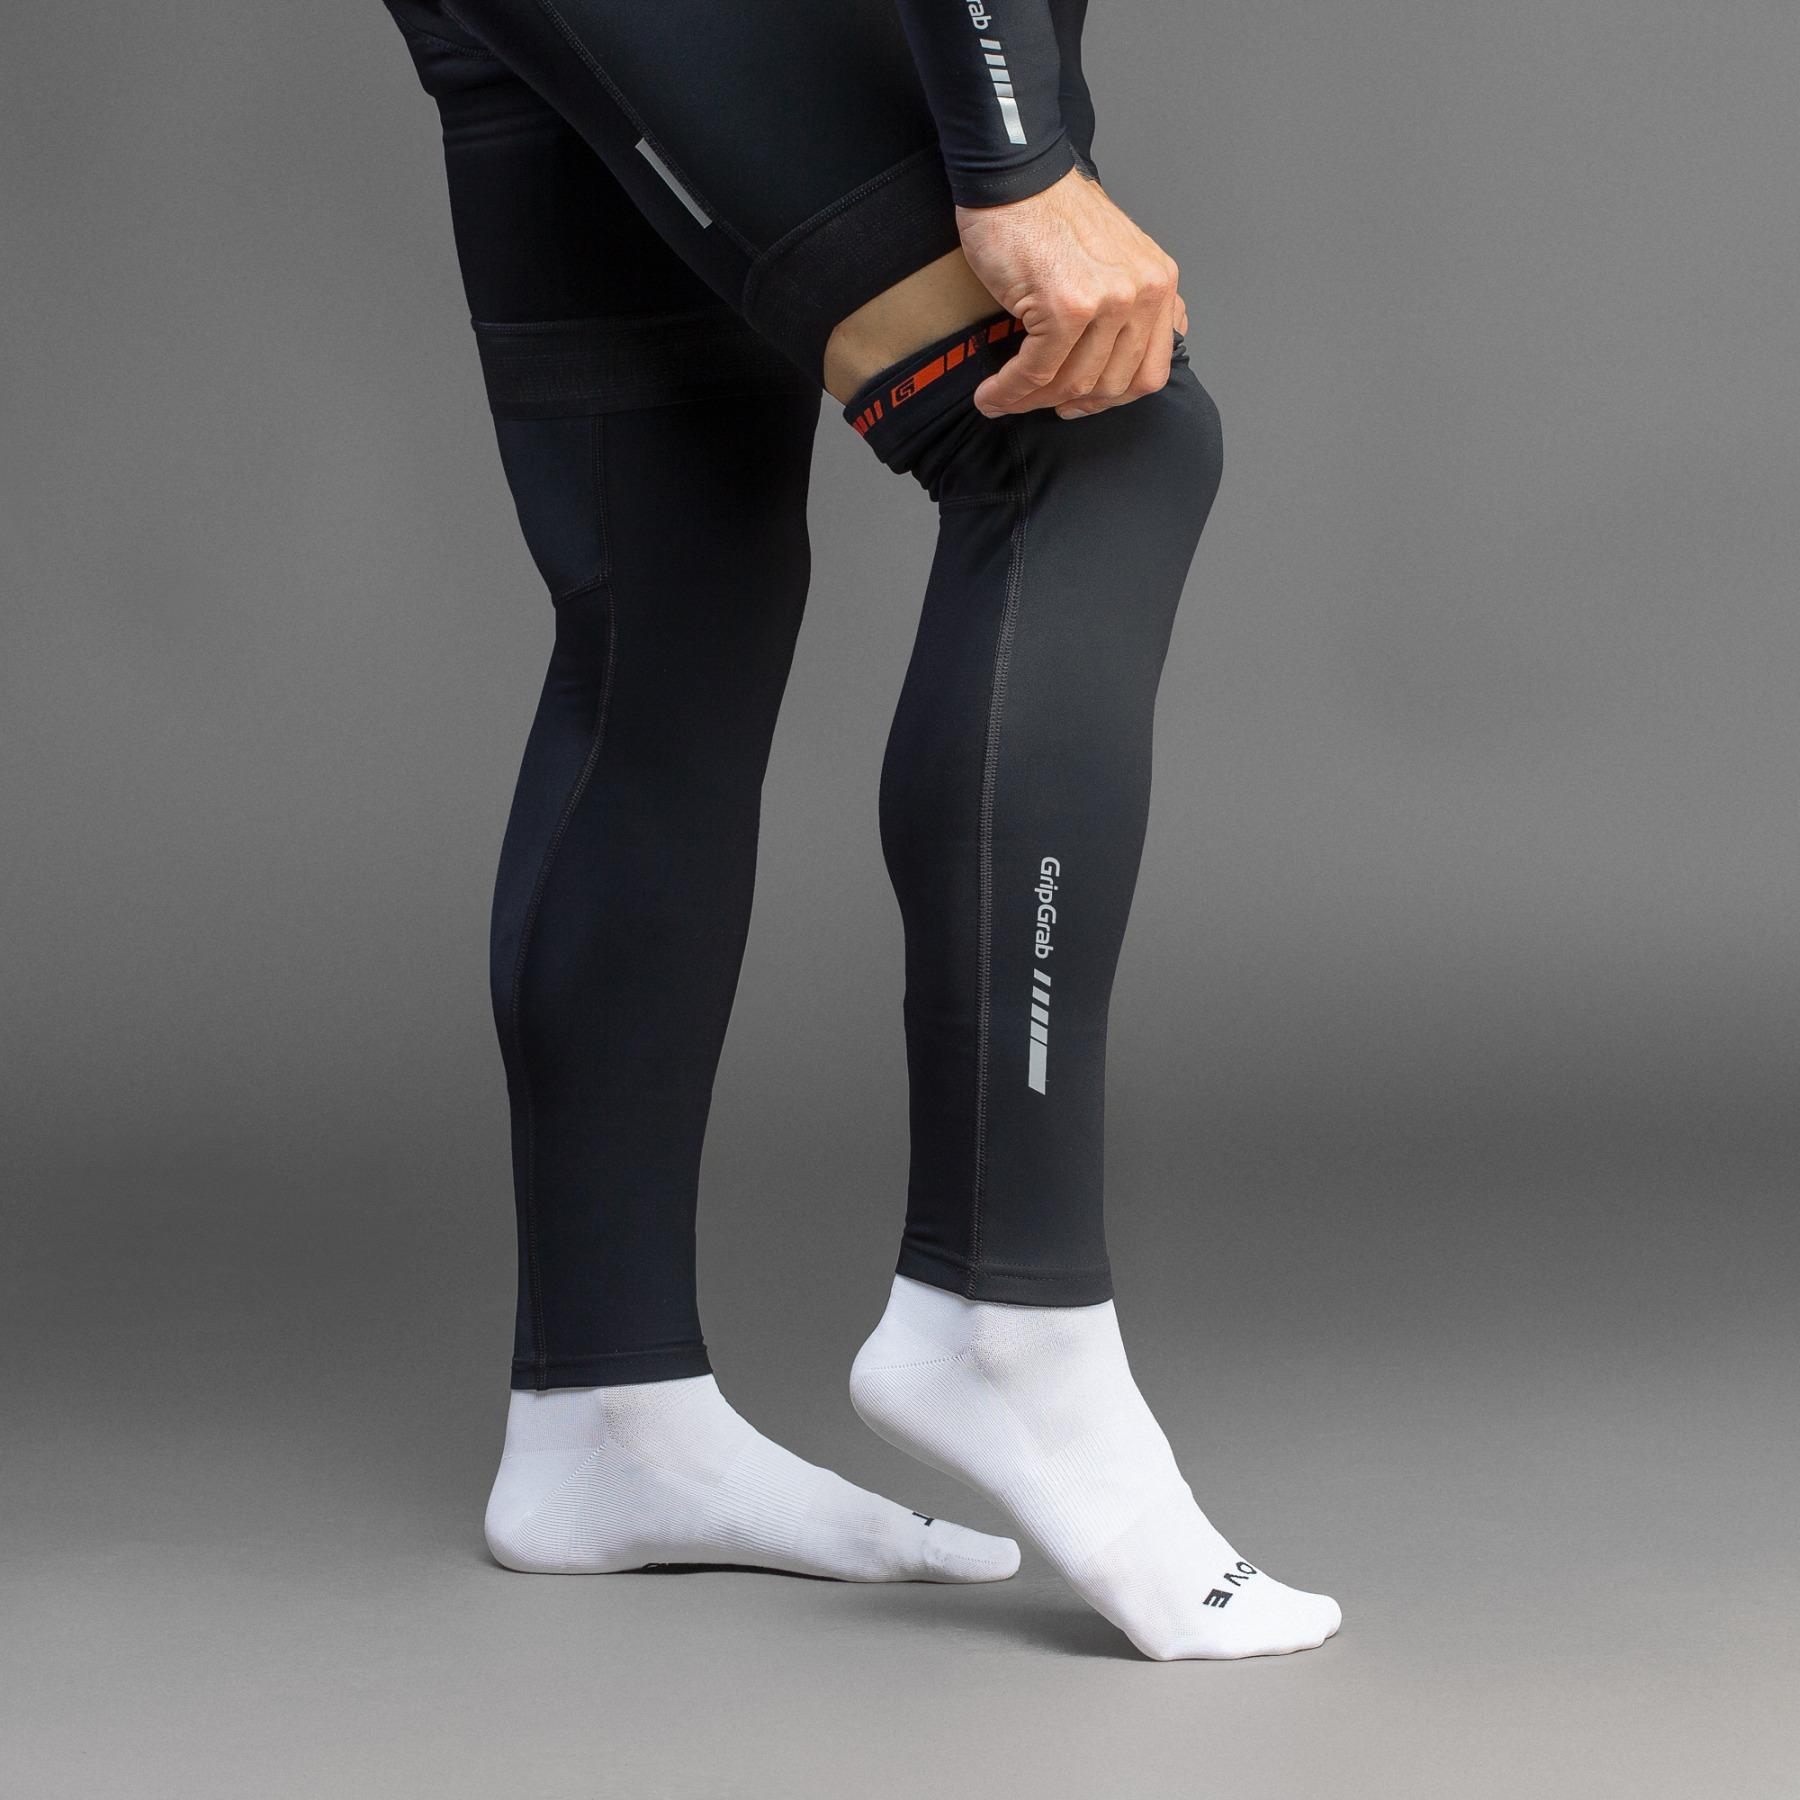 Image of GripGrab AquaRepel Thermal Leg Warmers - Black